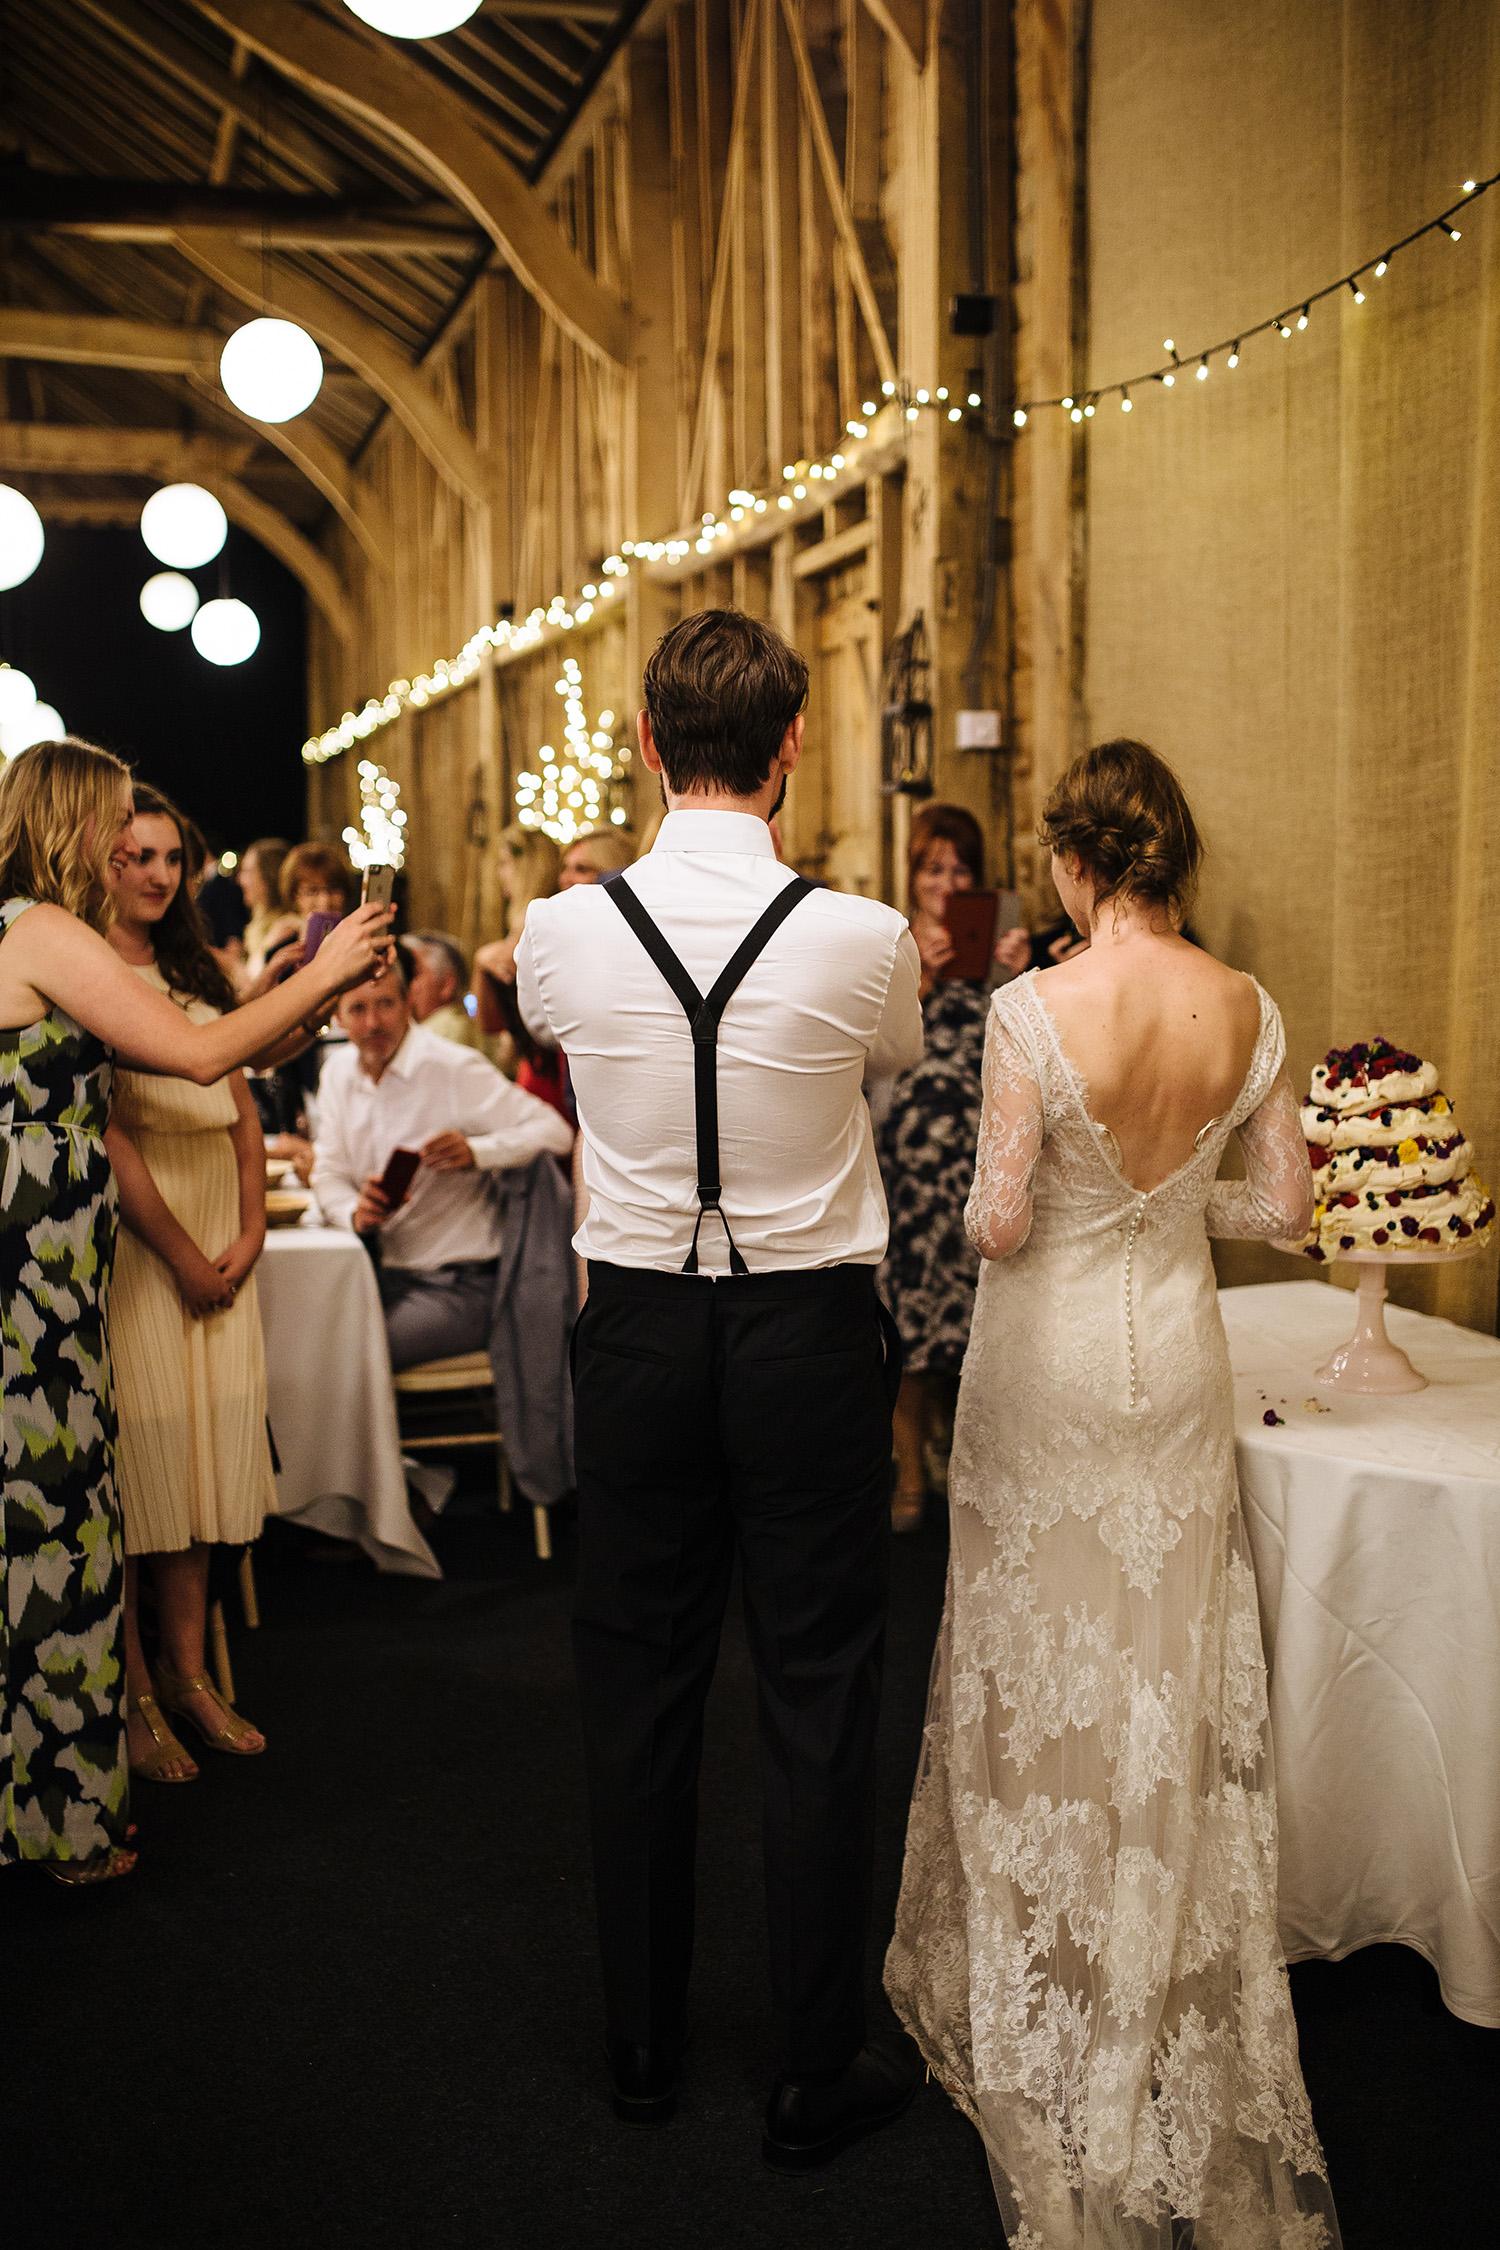 CHILDERLEY HALL CAMBRIDGE WEDDING 142.JPG